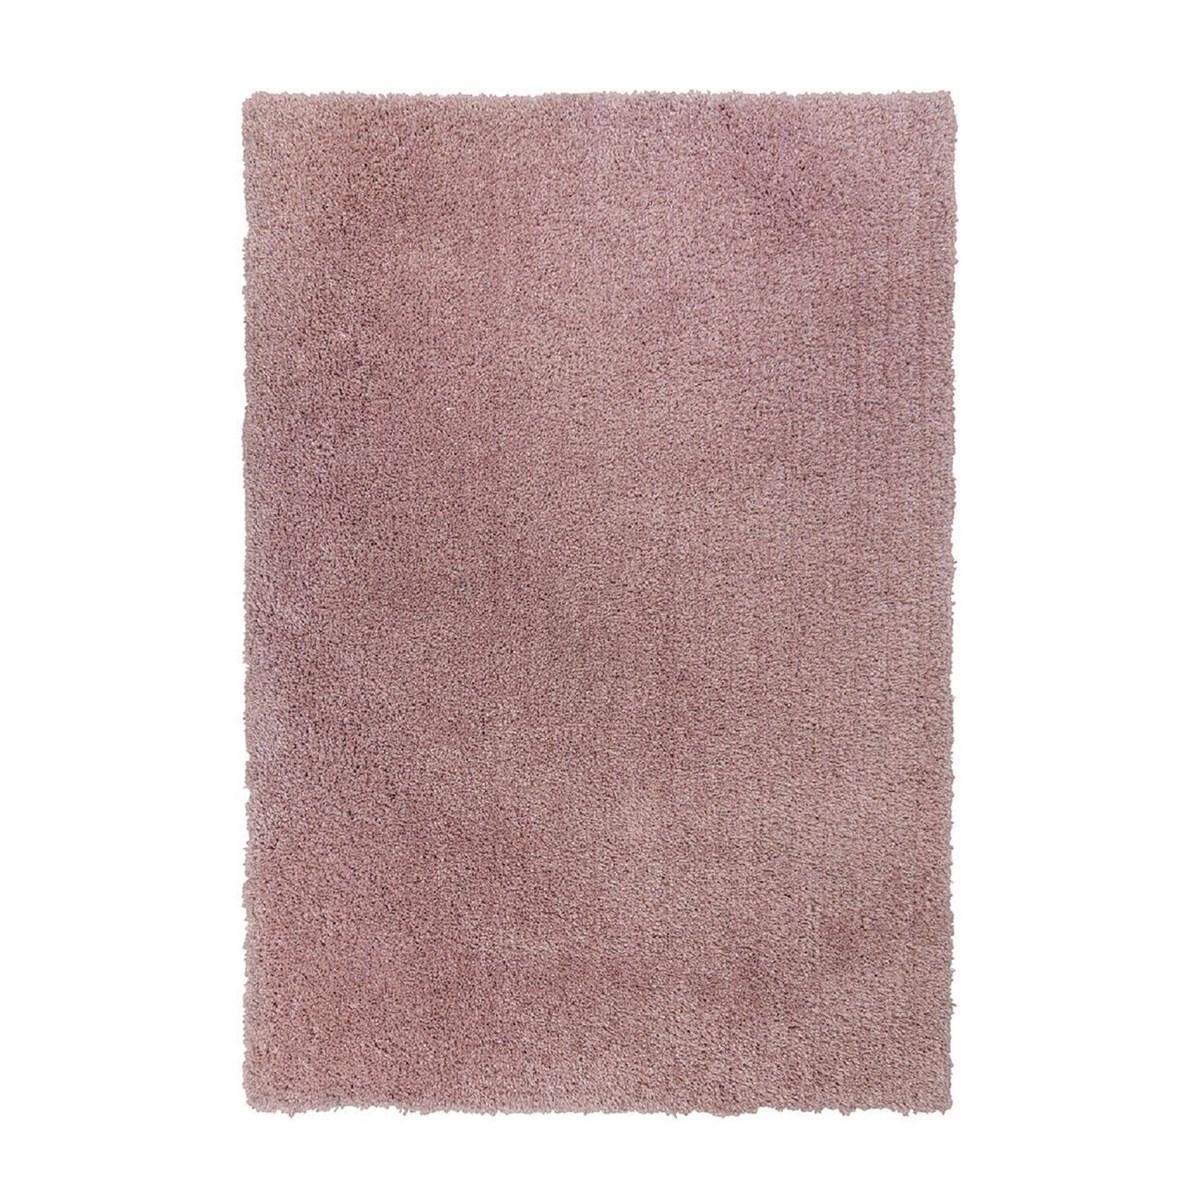 Tapis shaggy en Polyester Rose 120x170 cm